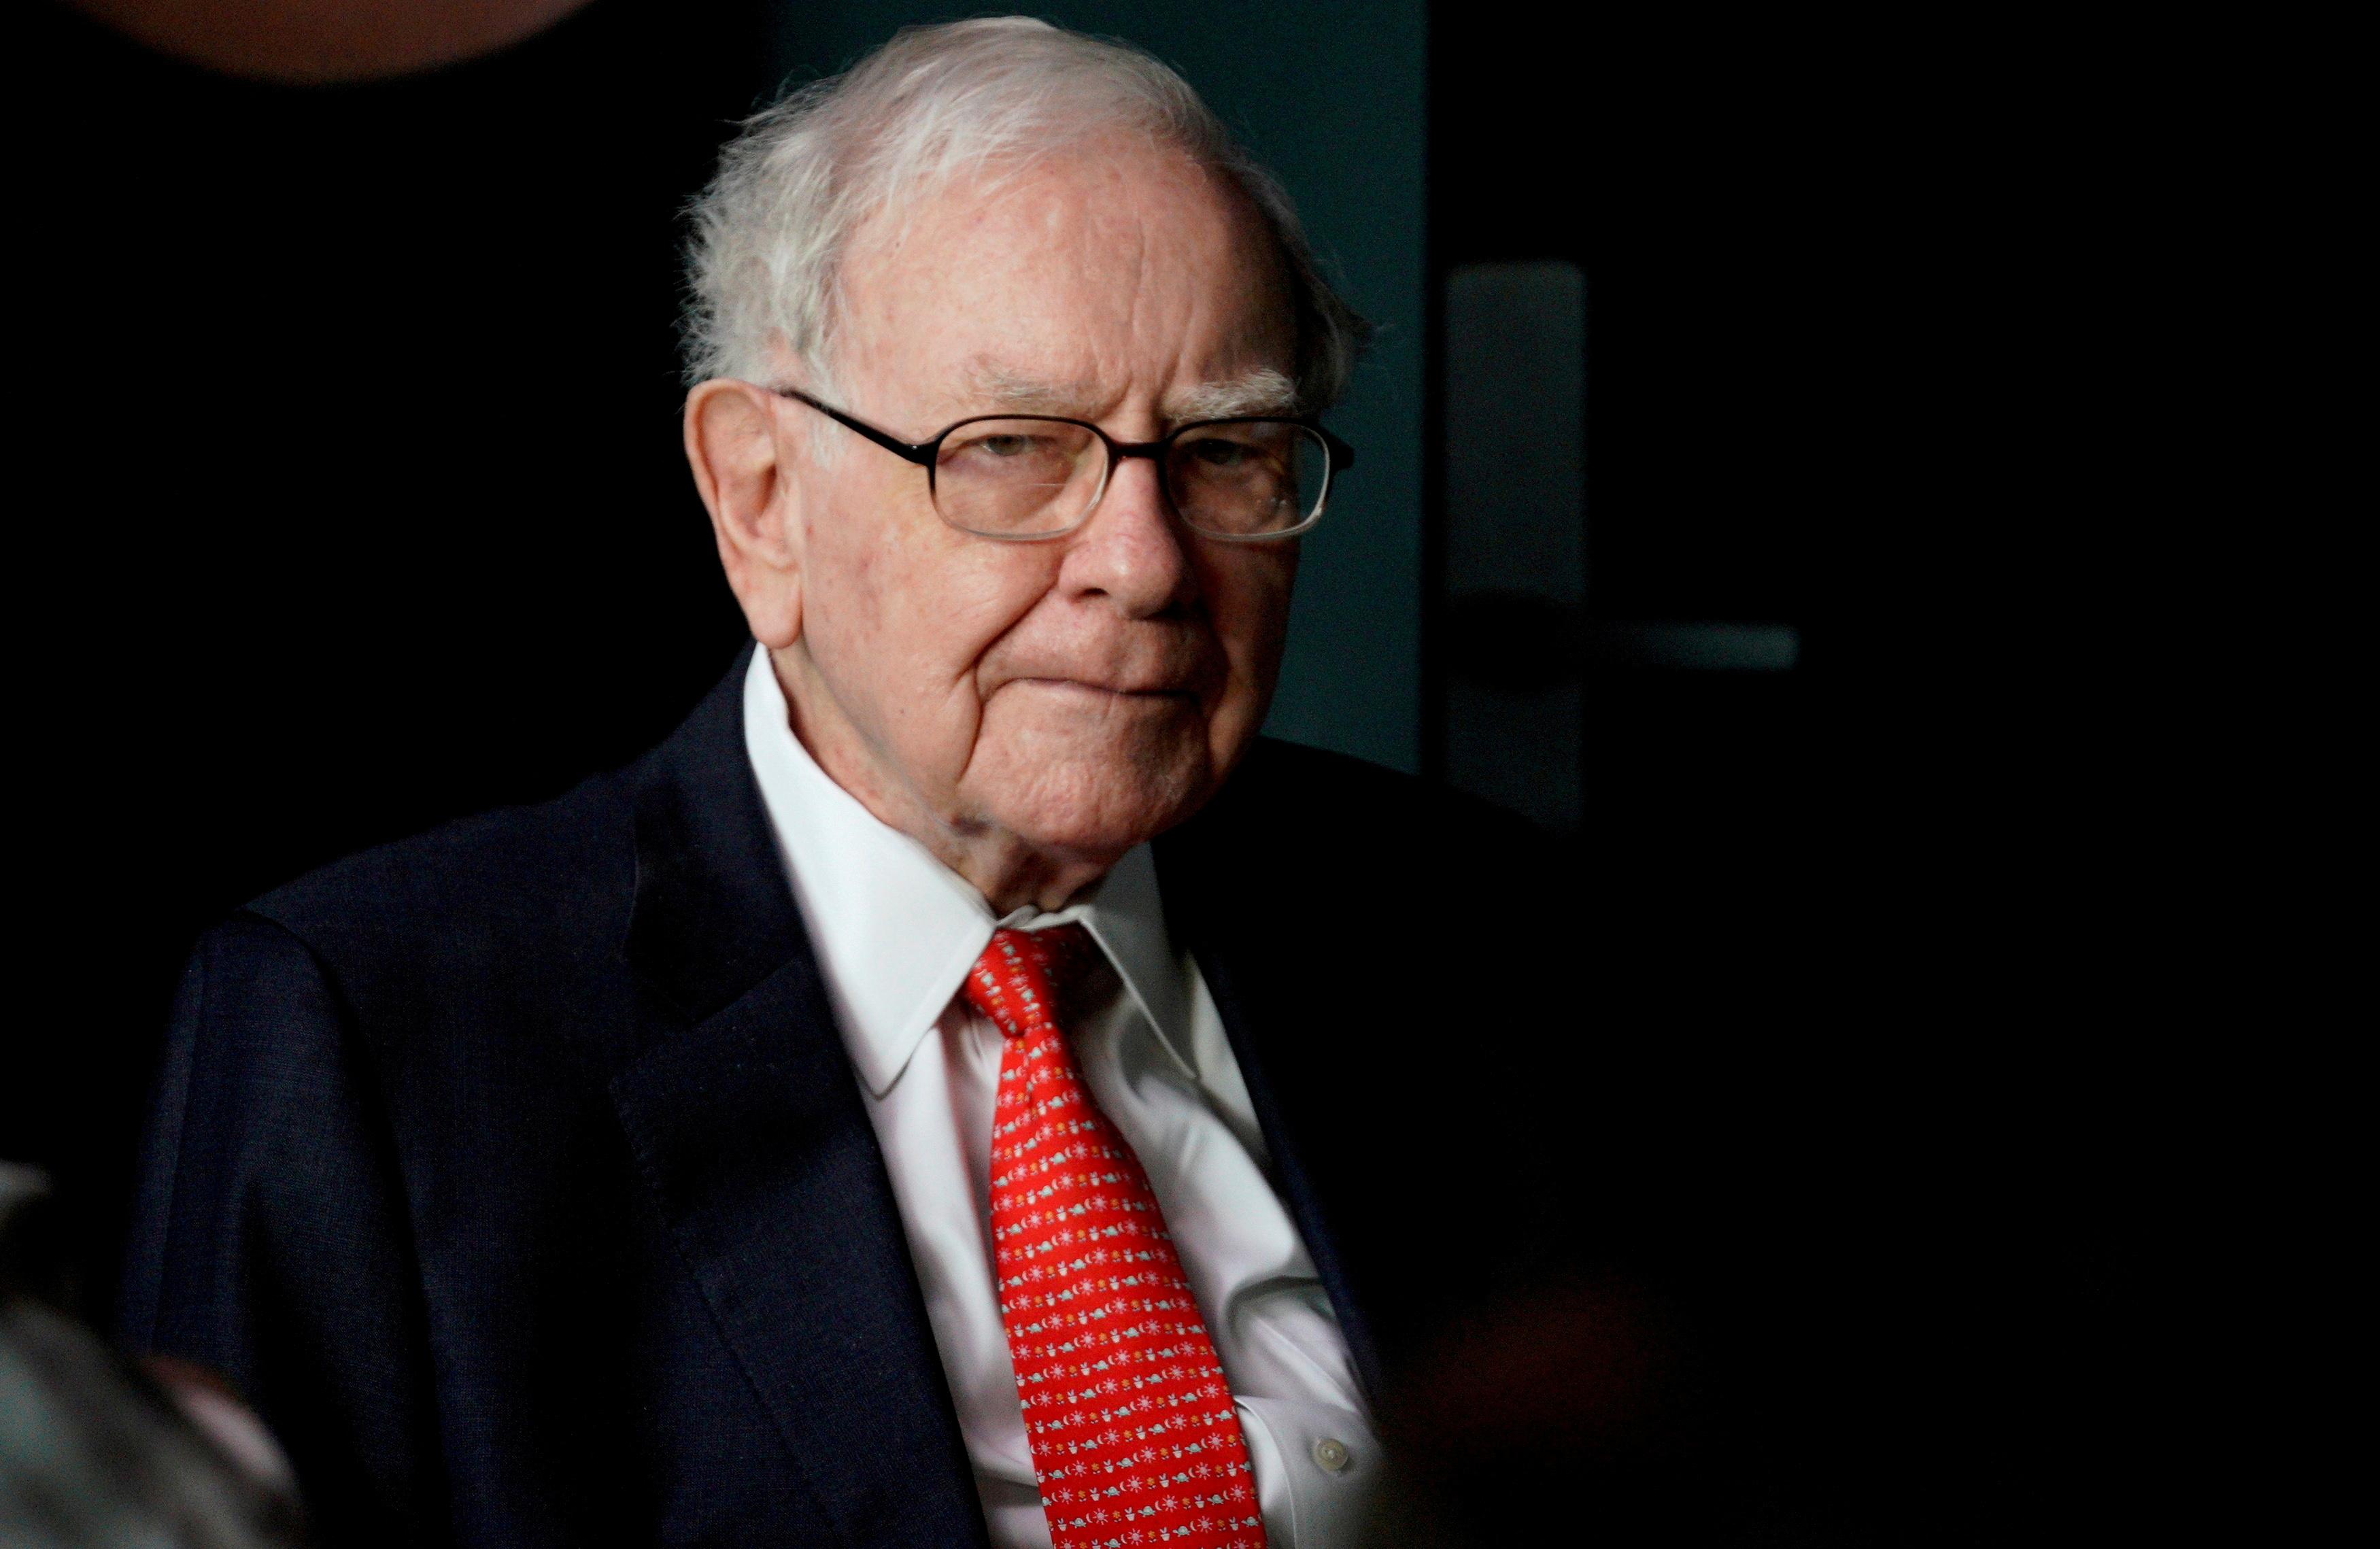 Warren Buffett, CEO of Berkshire Hathaway Inc, pauses while playing bridge as part of the company annual meeting weekend in Omaha, Nebraska U.S. May 6, 2018. REUTERS/Rick Wilking